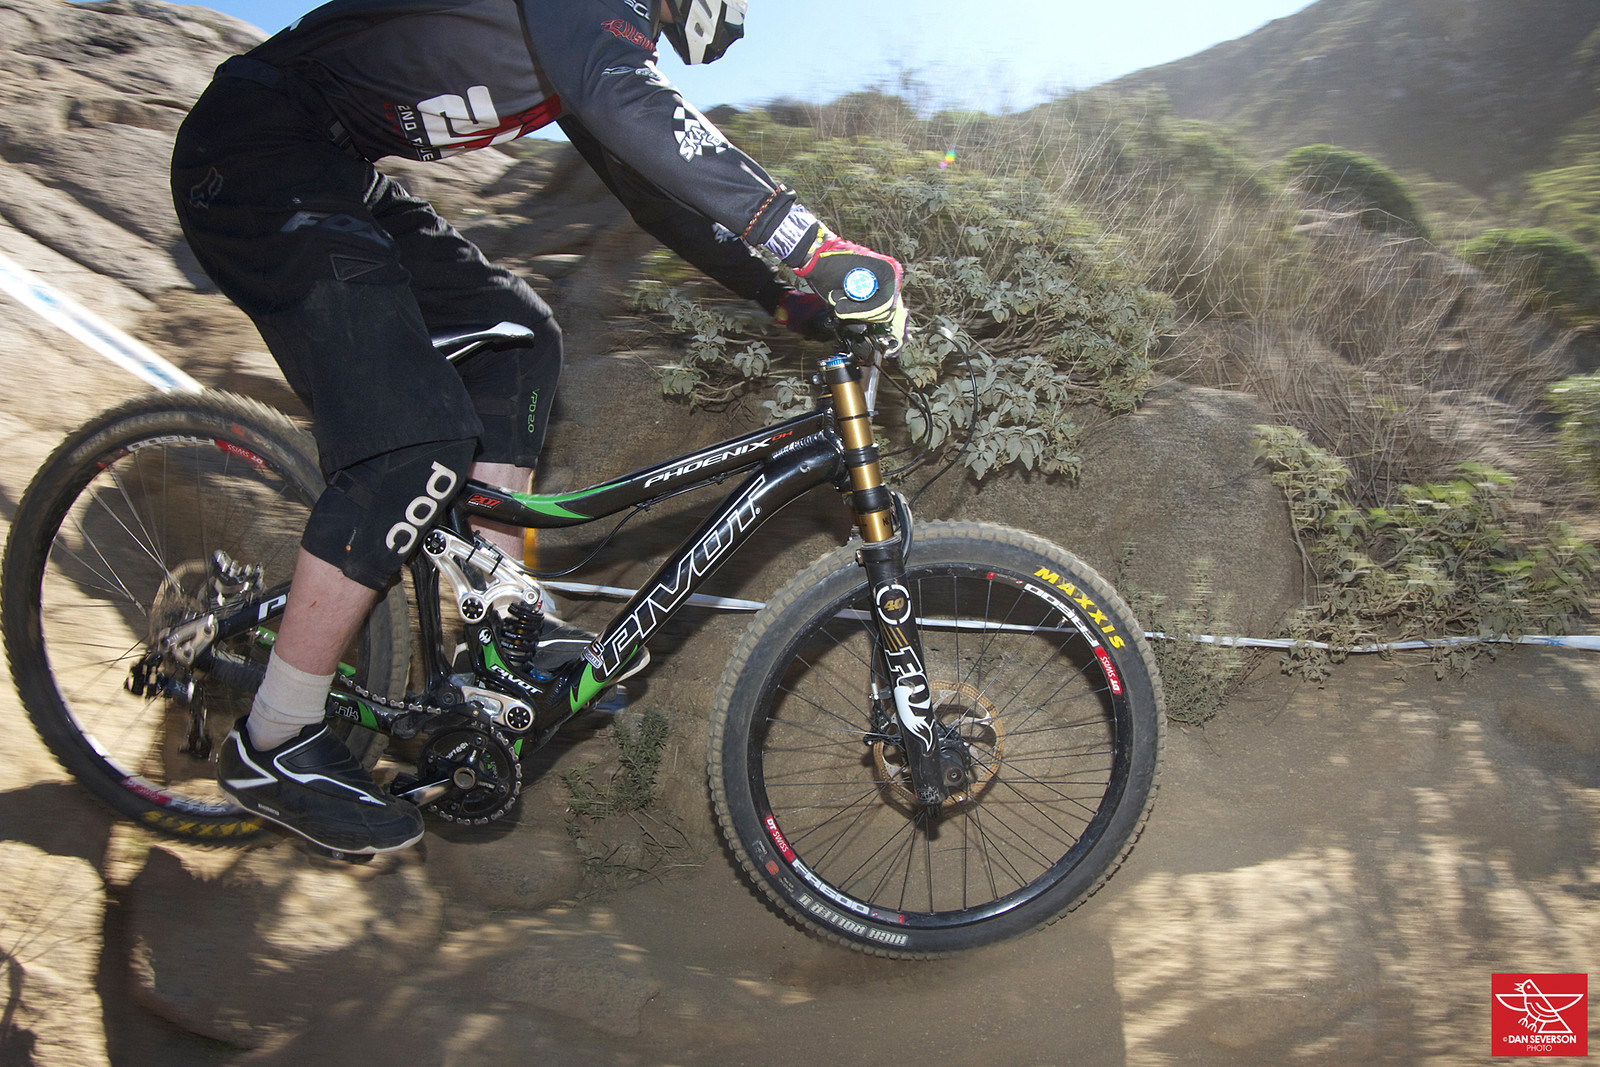 G-Out Project: Fontana 2015 - Pivot Phoenix DH - danseverson photo - Mountain Biking Pictures - Vital MTB